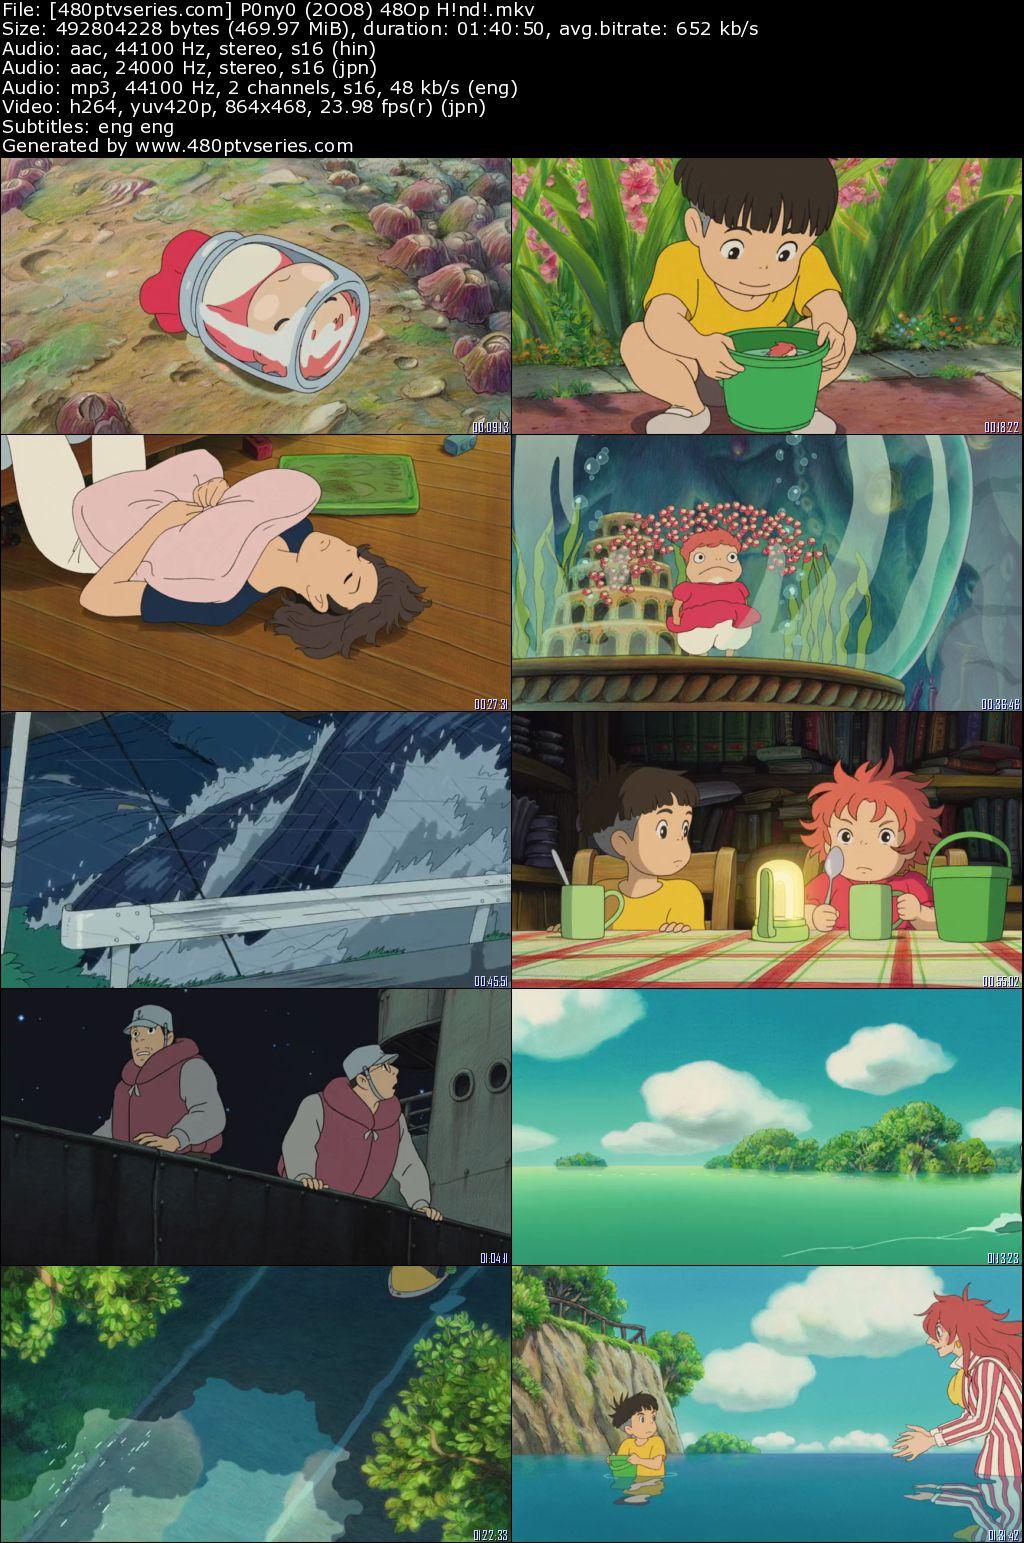 Ponyo (2008) 450Mb Full Hindi Dual Audio Movie Download 480p Bluray Free Watch Online Full Movie Download Worldfree4u 9xmovies